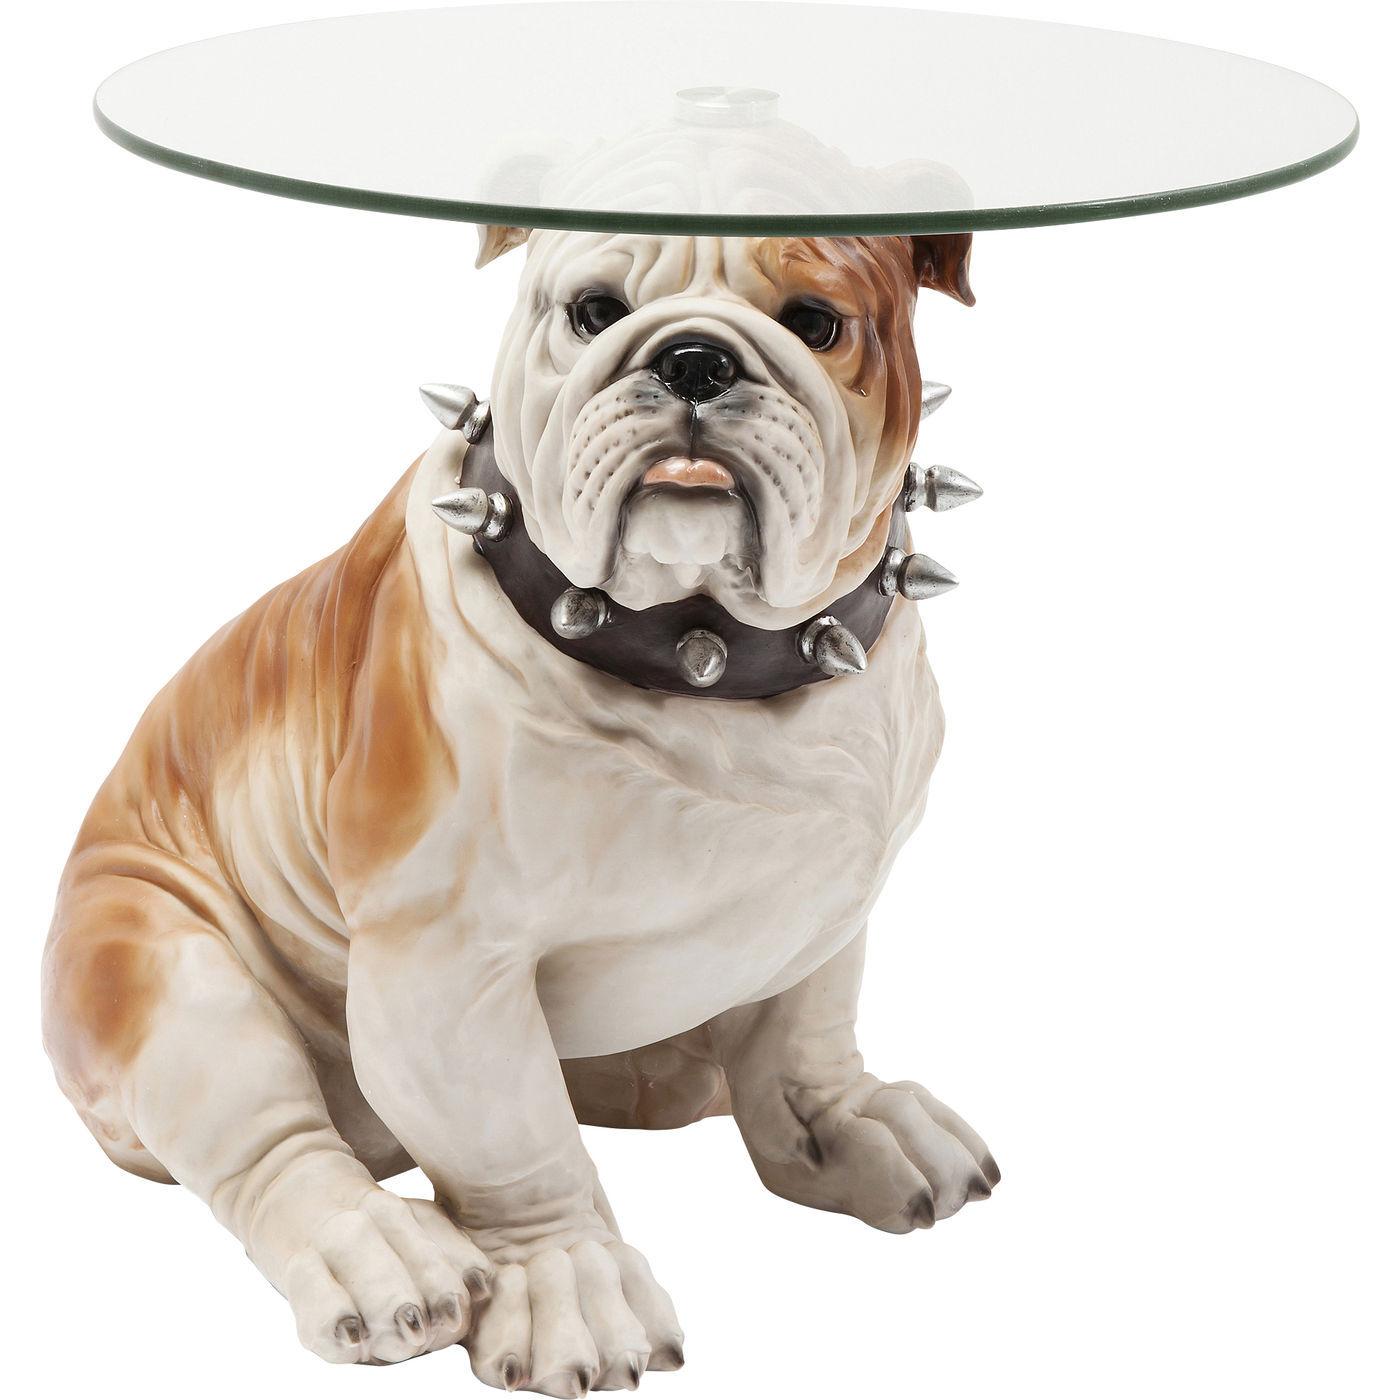 KARE DESIGN Visible Watching Bulldog sidebord - klart glas og brun/hvid polyresin